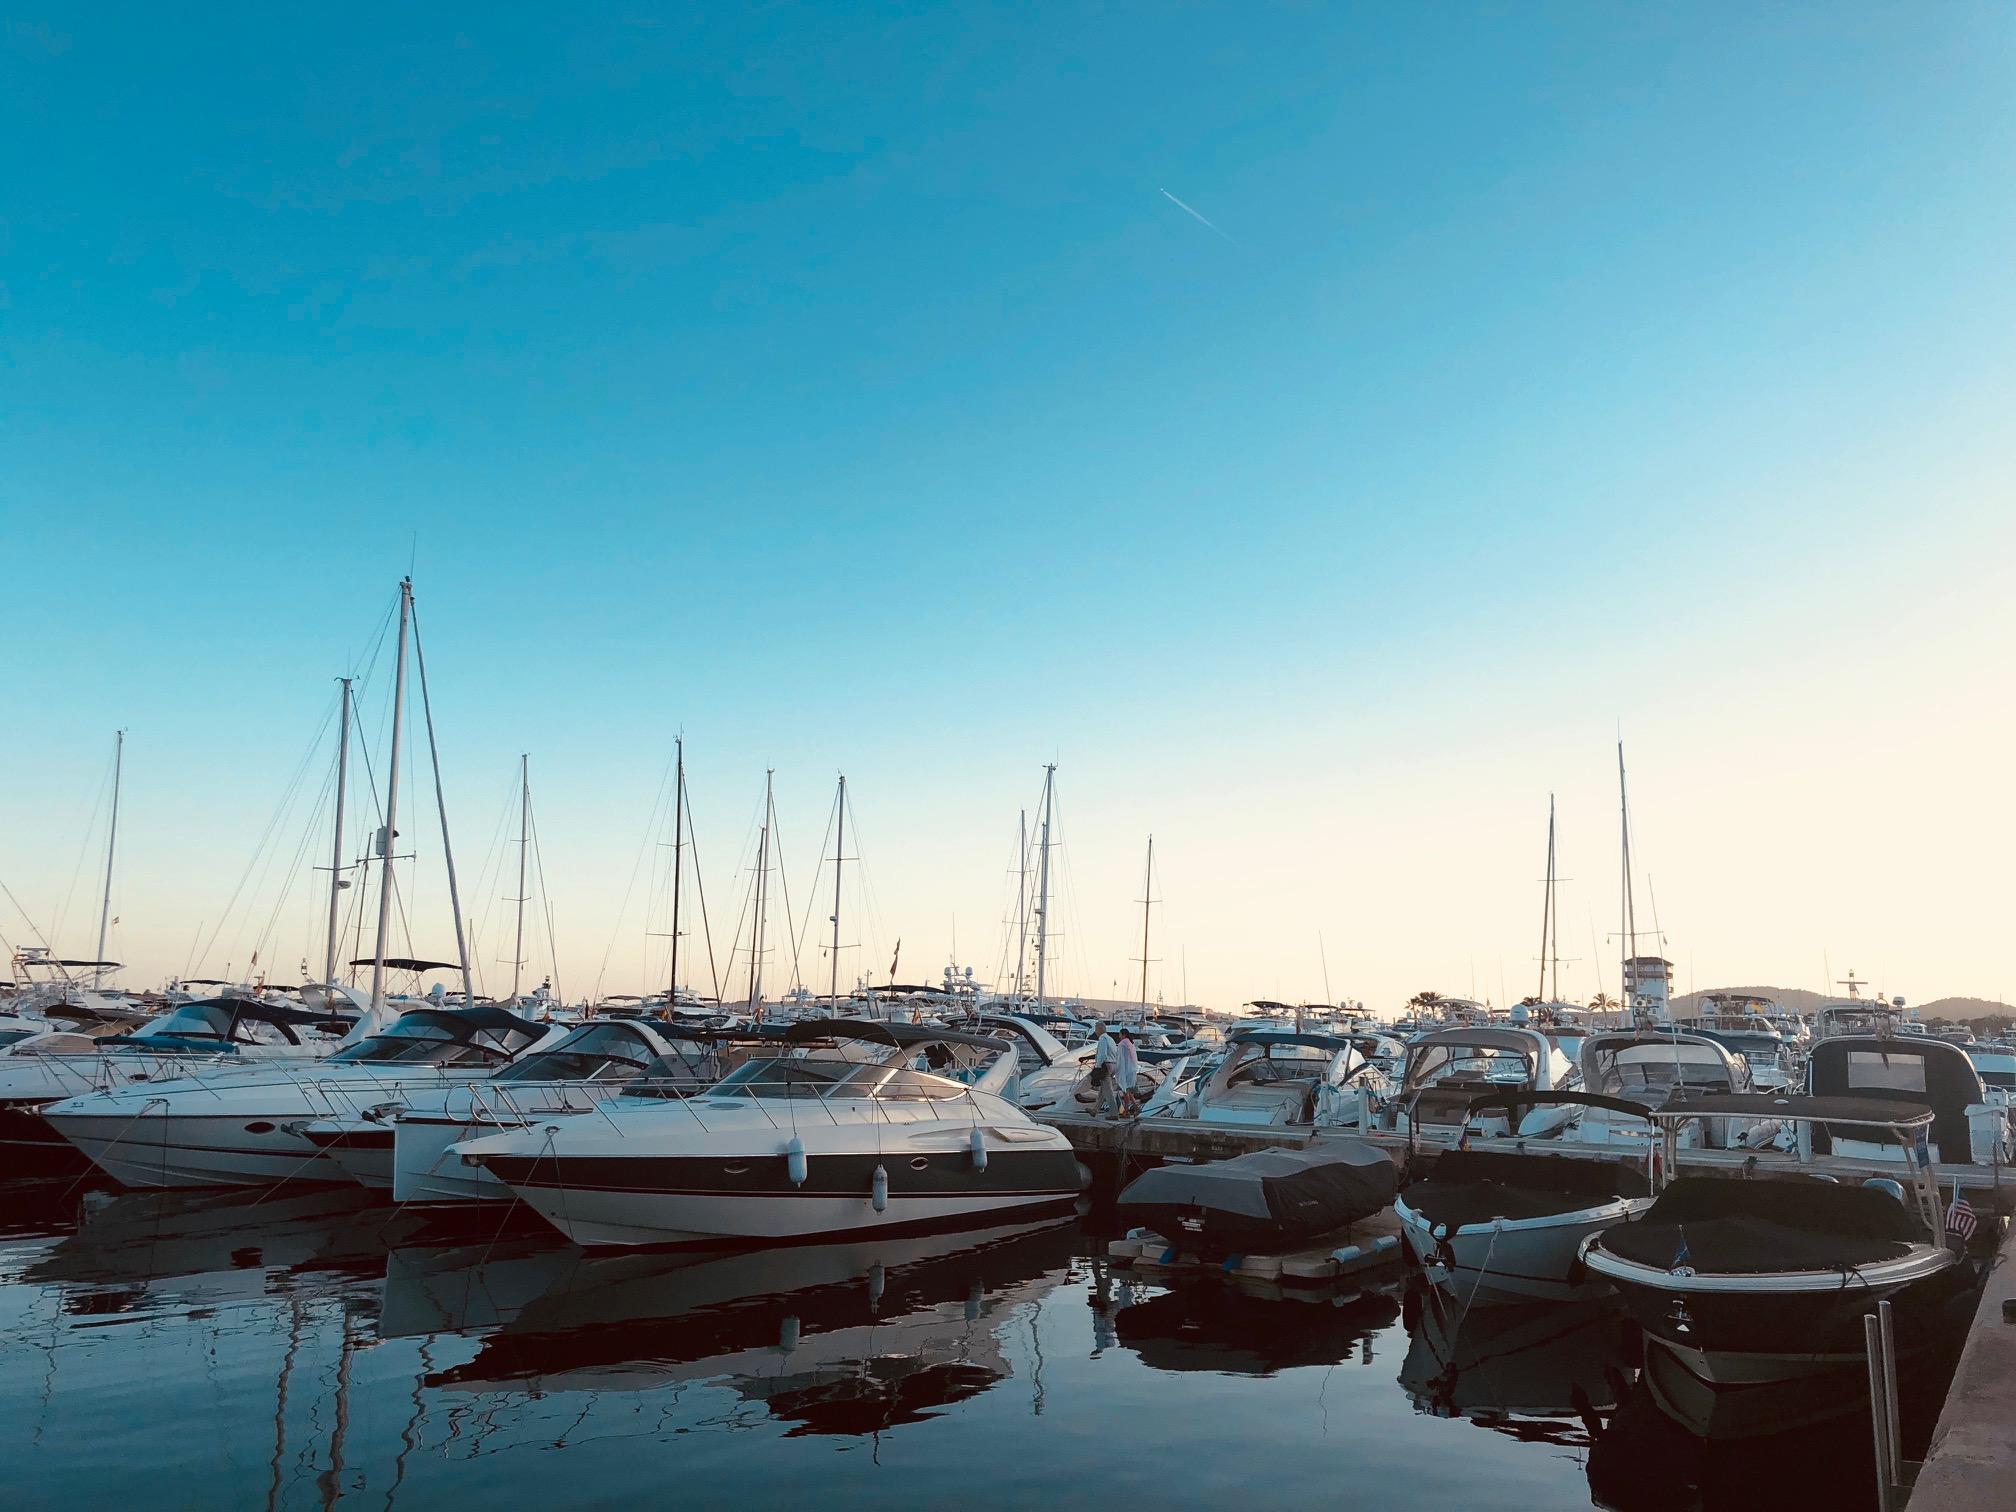 The famous marina of Puerto Portals is the landmark of Portals Nous.